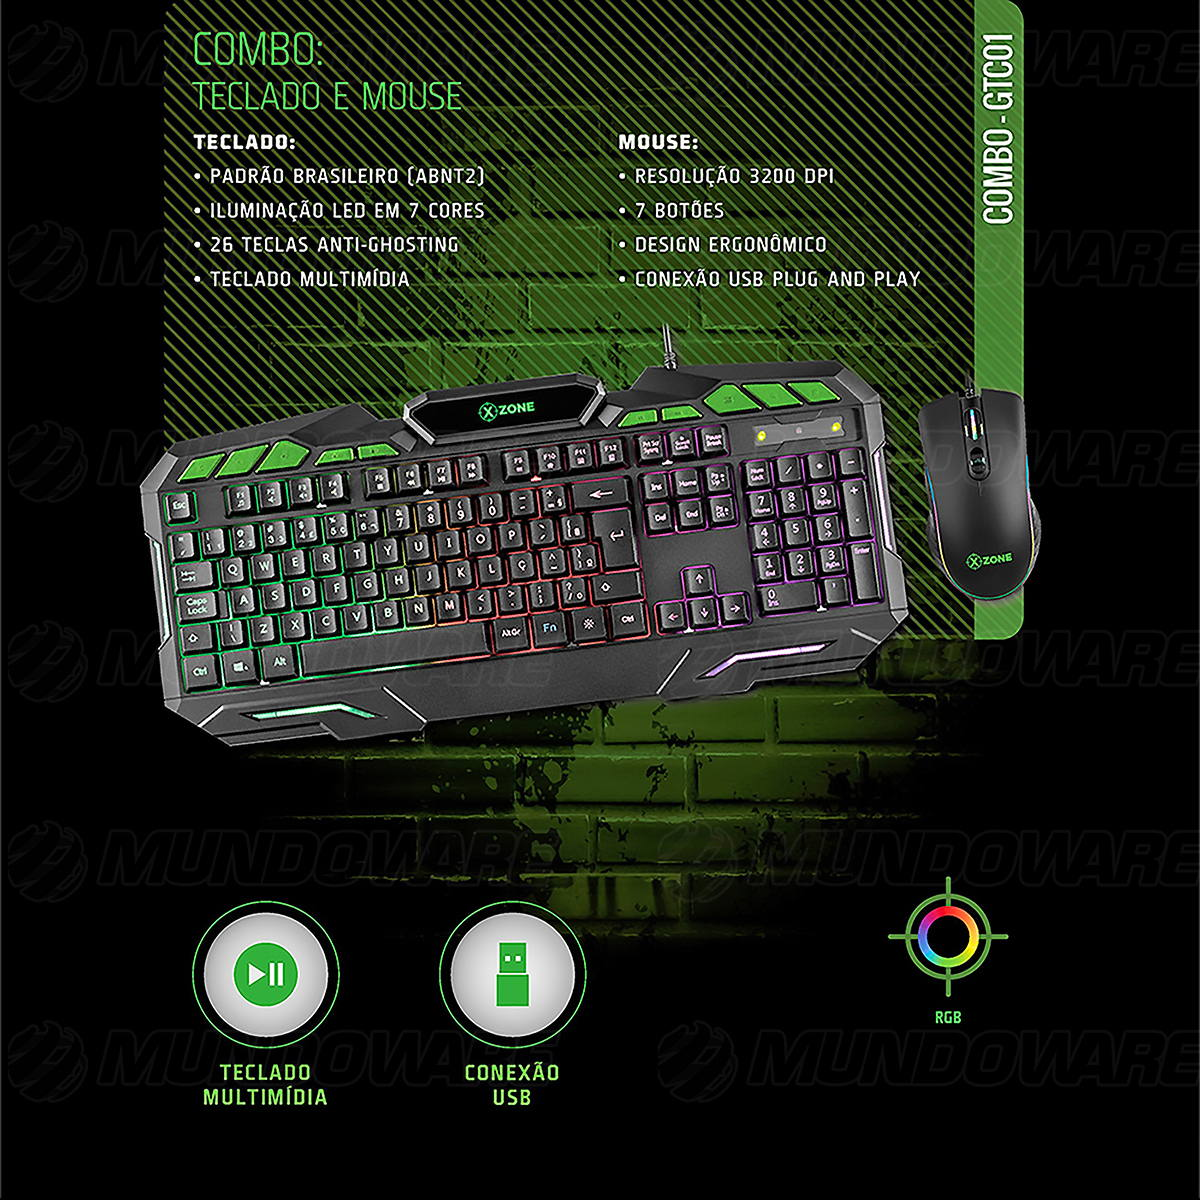 Combo Gamer 2 em 1 Teclado + Mouse USB ABNT2 LED 7 Cores 26 Teclas Anti-Ghosting 3200DPI 7 Botões XZone GTC-01